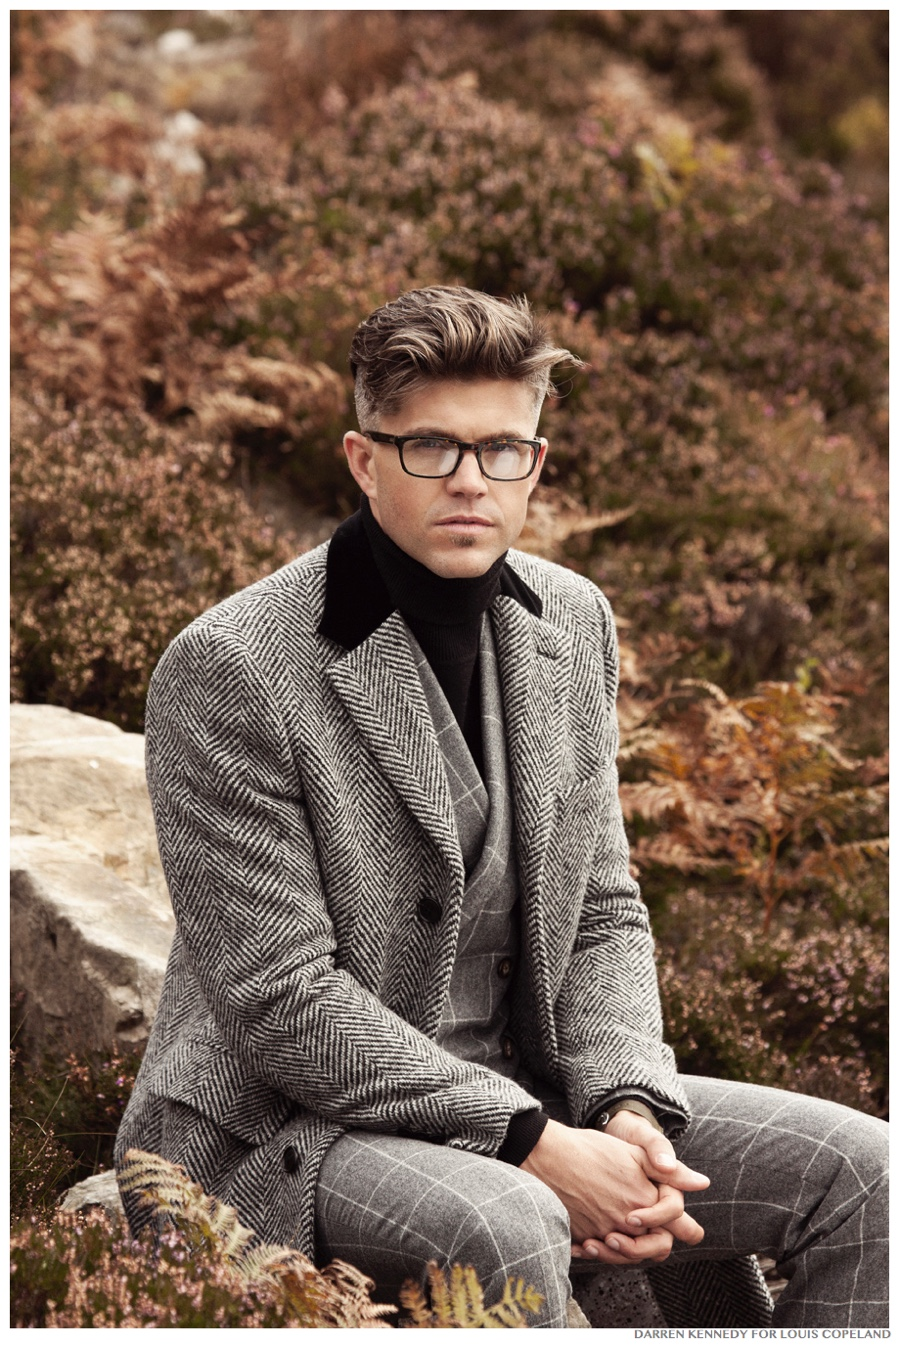 Darren-Kennedy-Louis-Copeland-Fall-Winter-2014-006